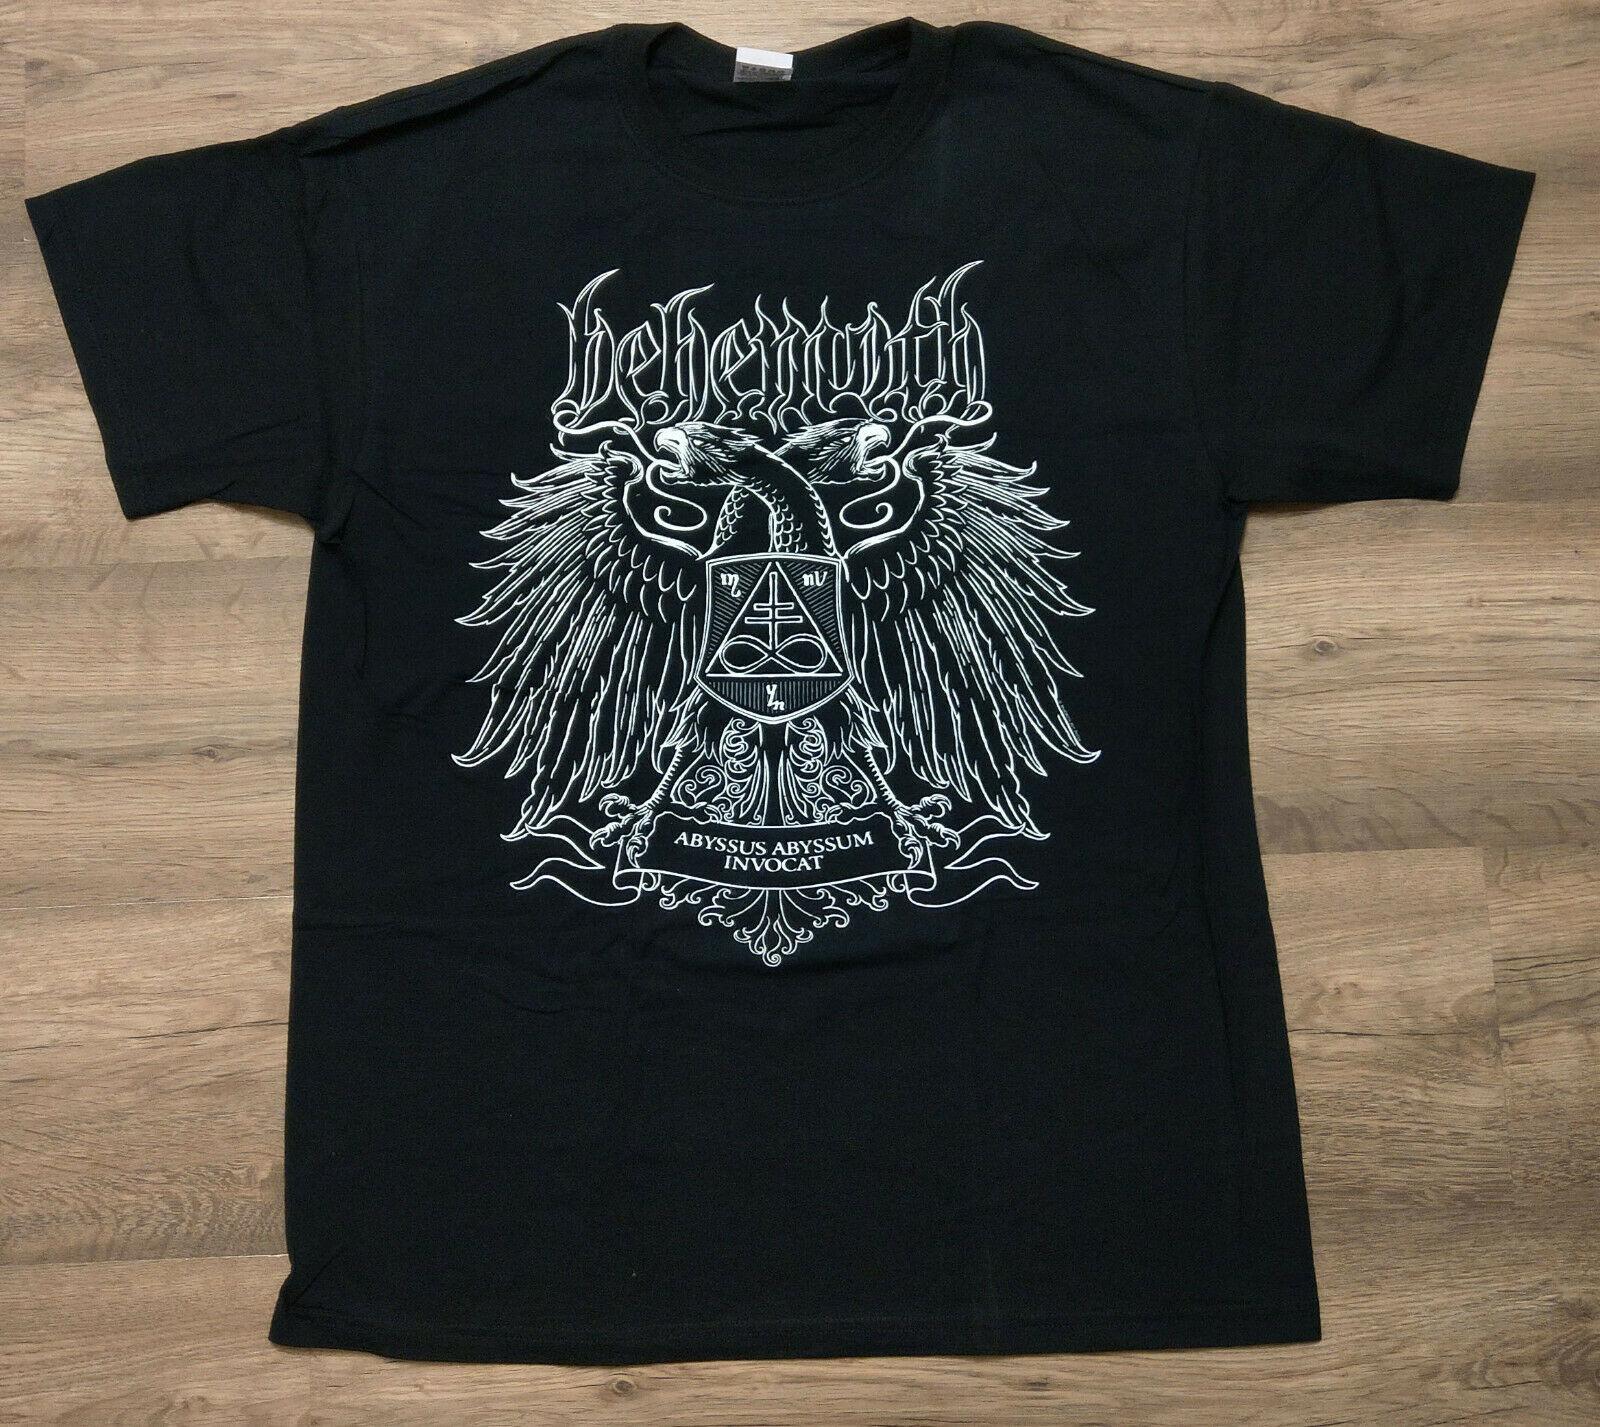 Behemoth - Abyssus Abissum Invocat (T-Shirt)